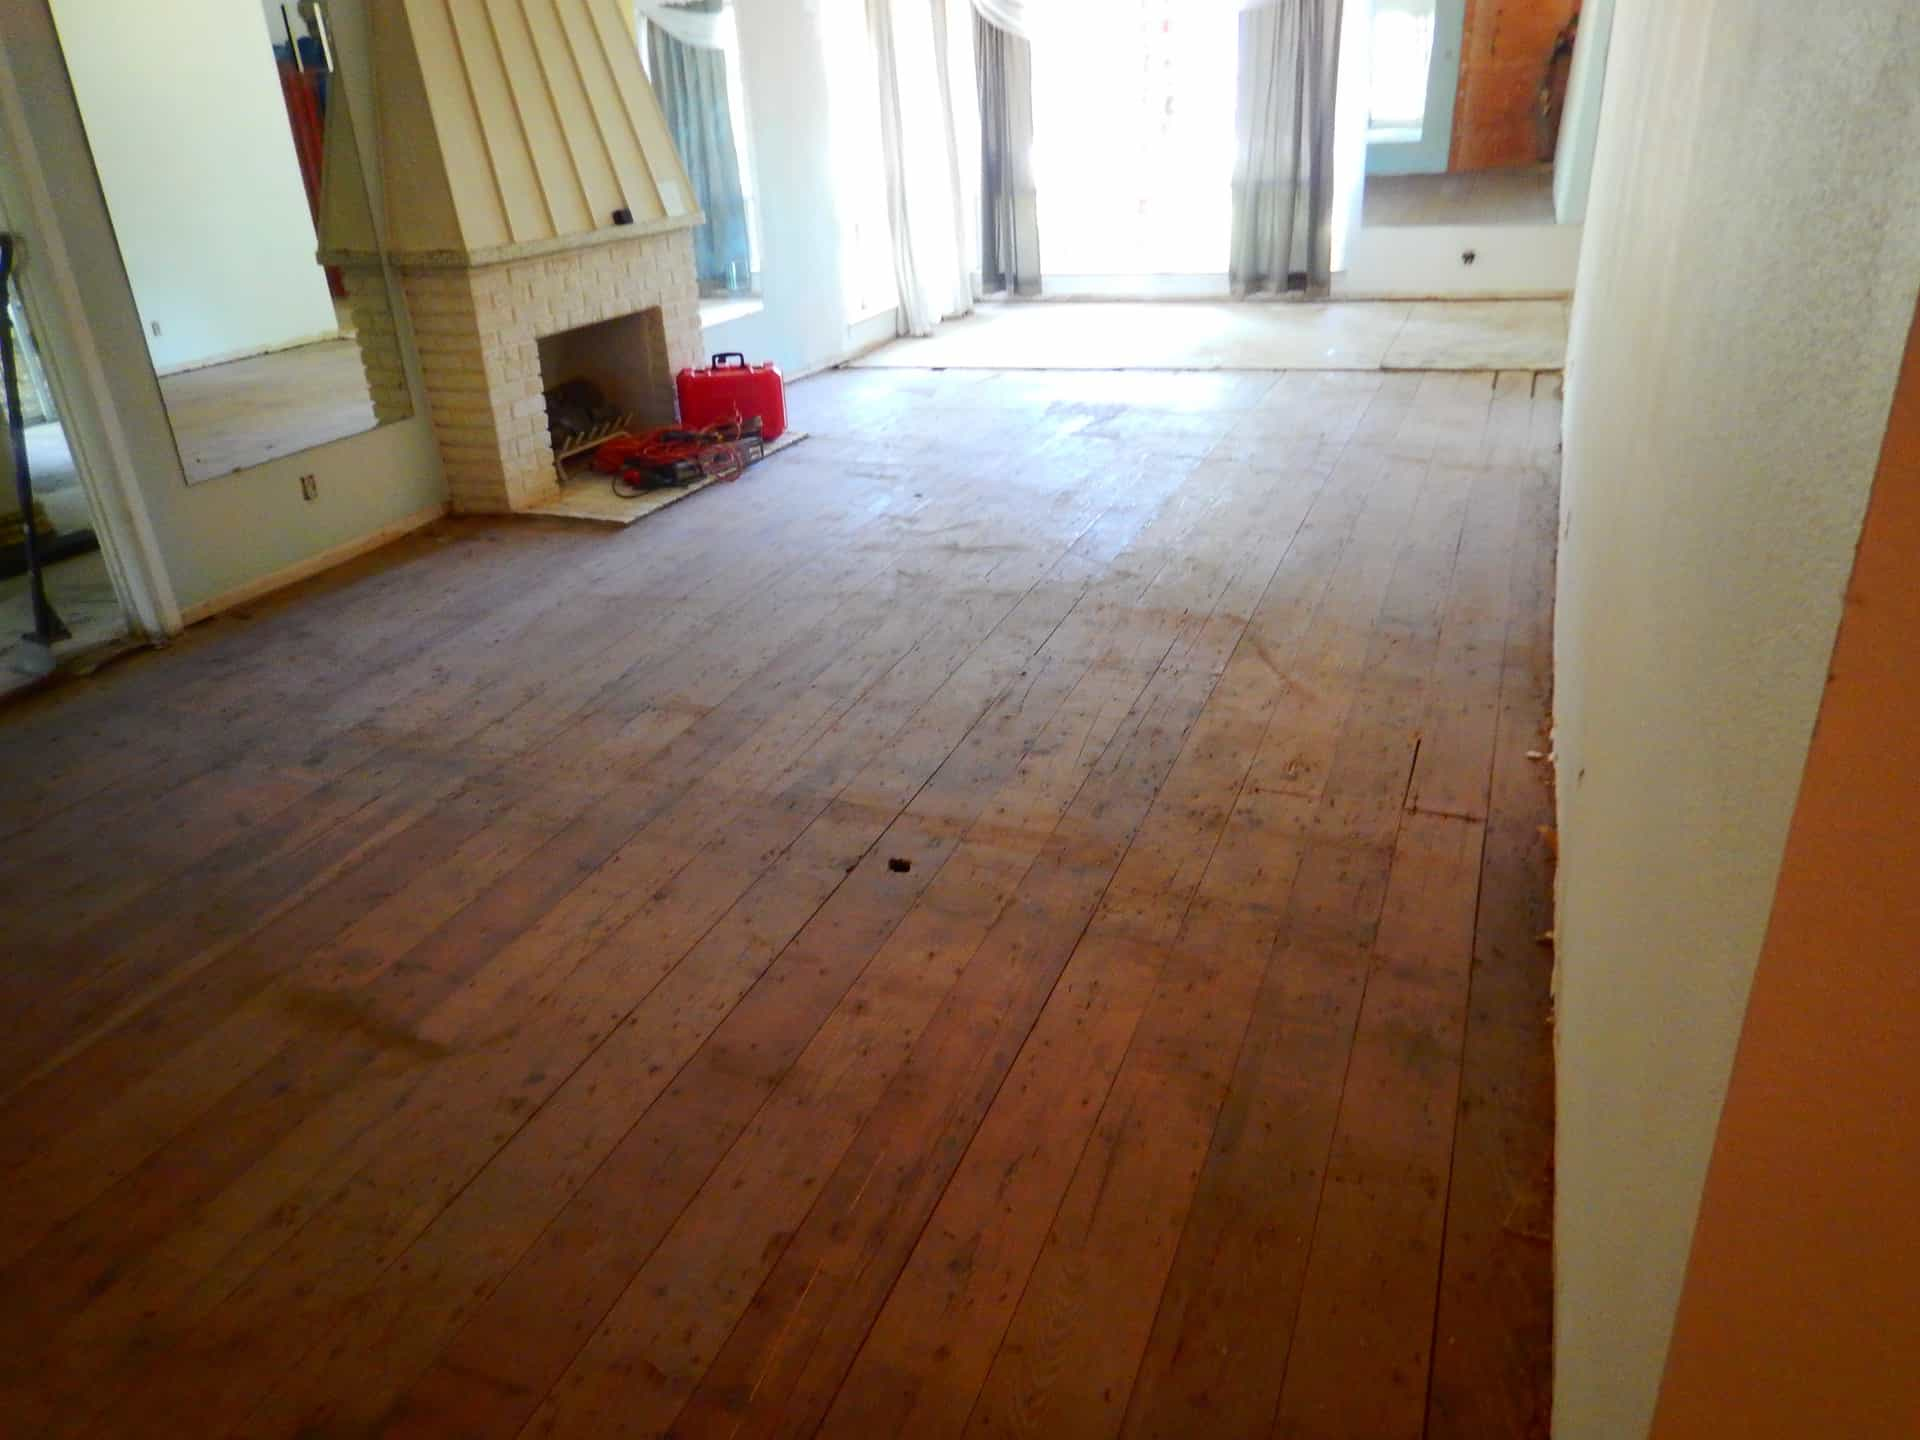 The Martin Floor